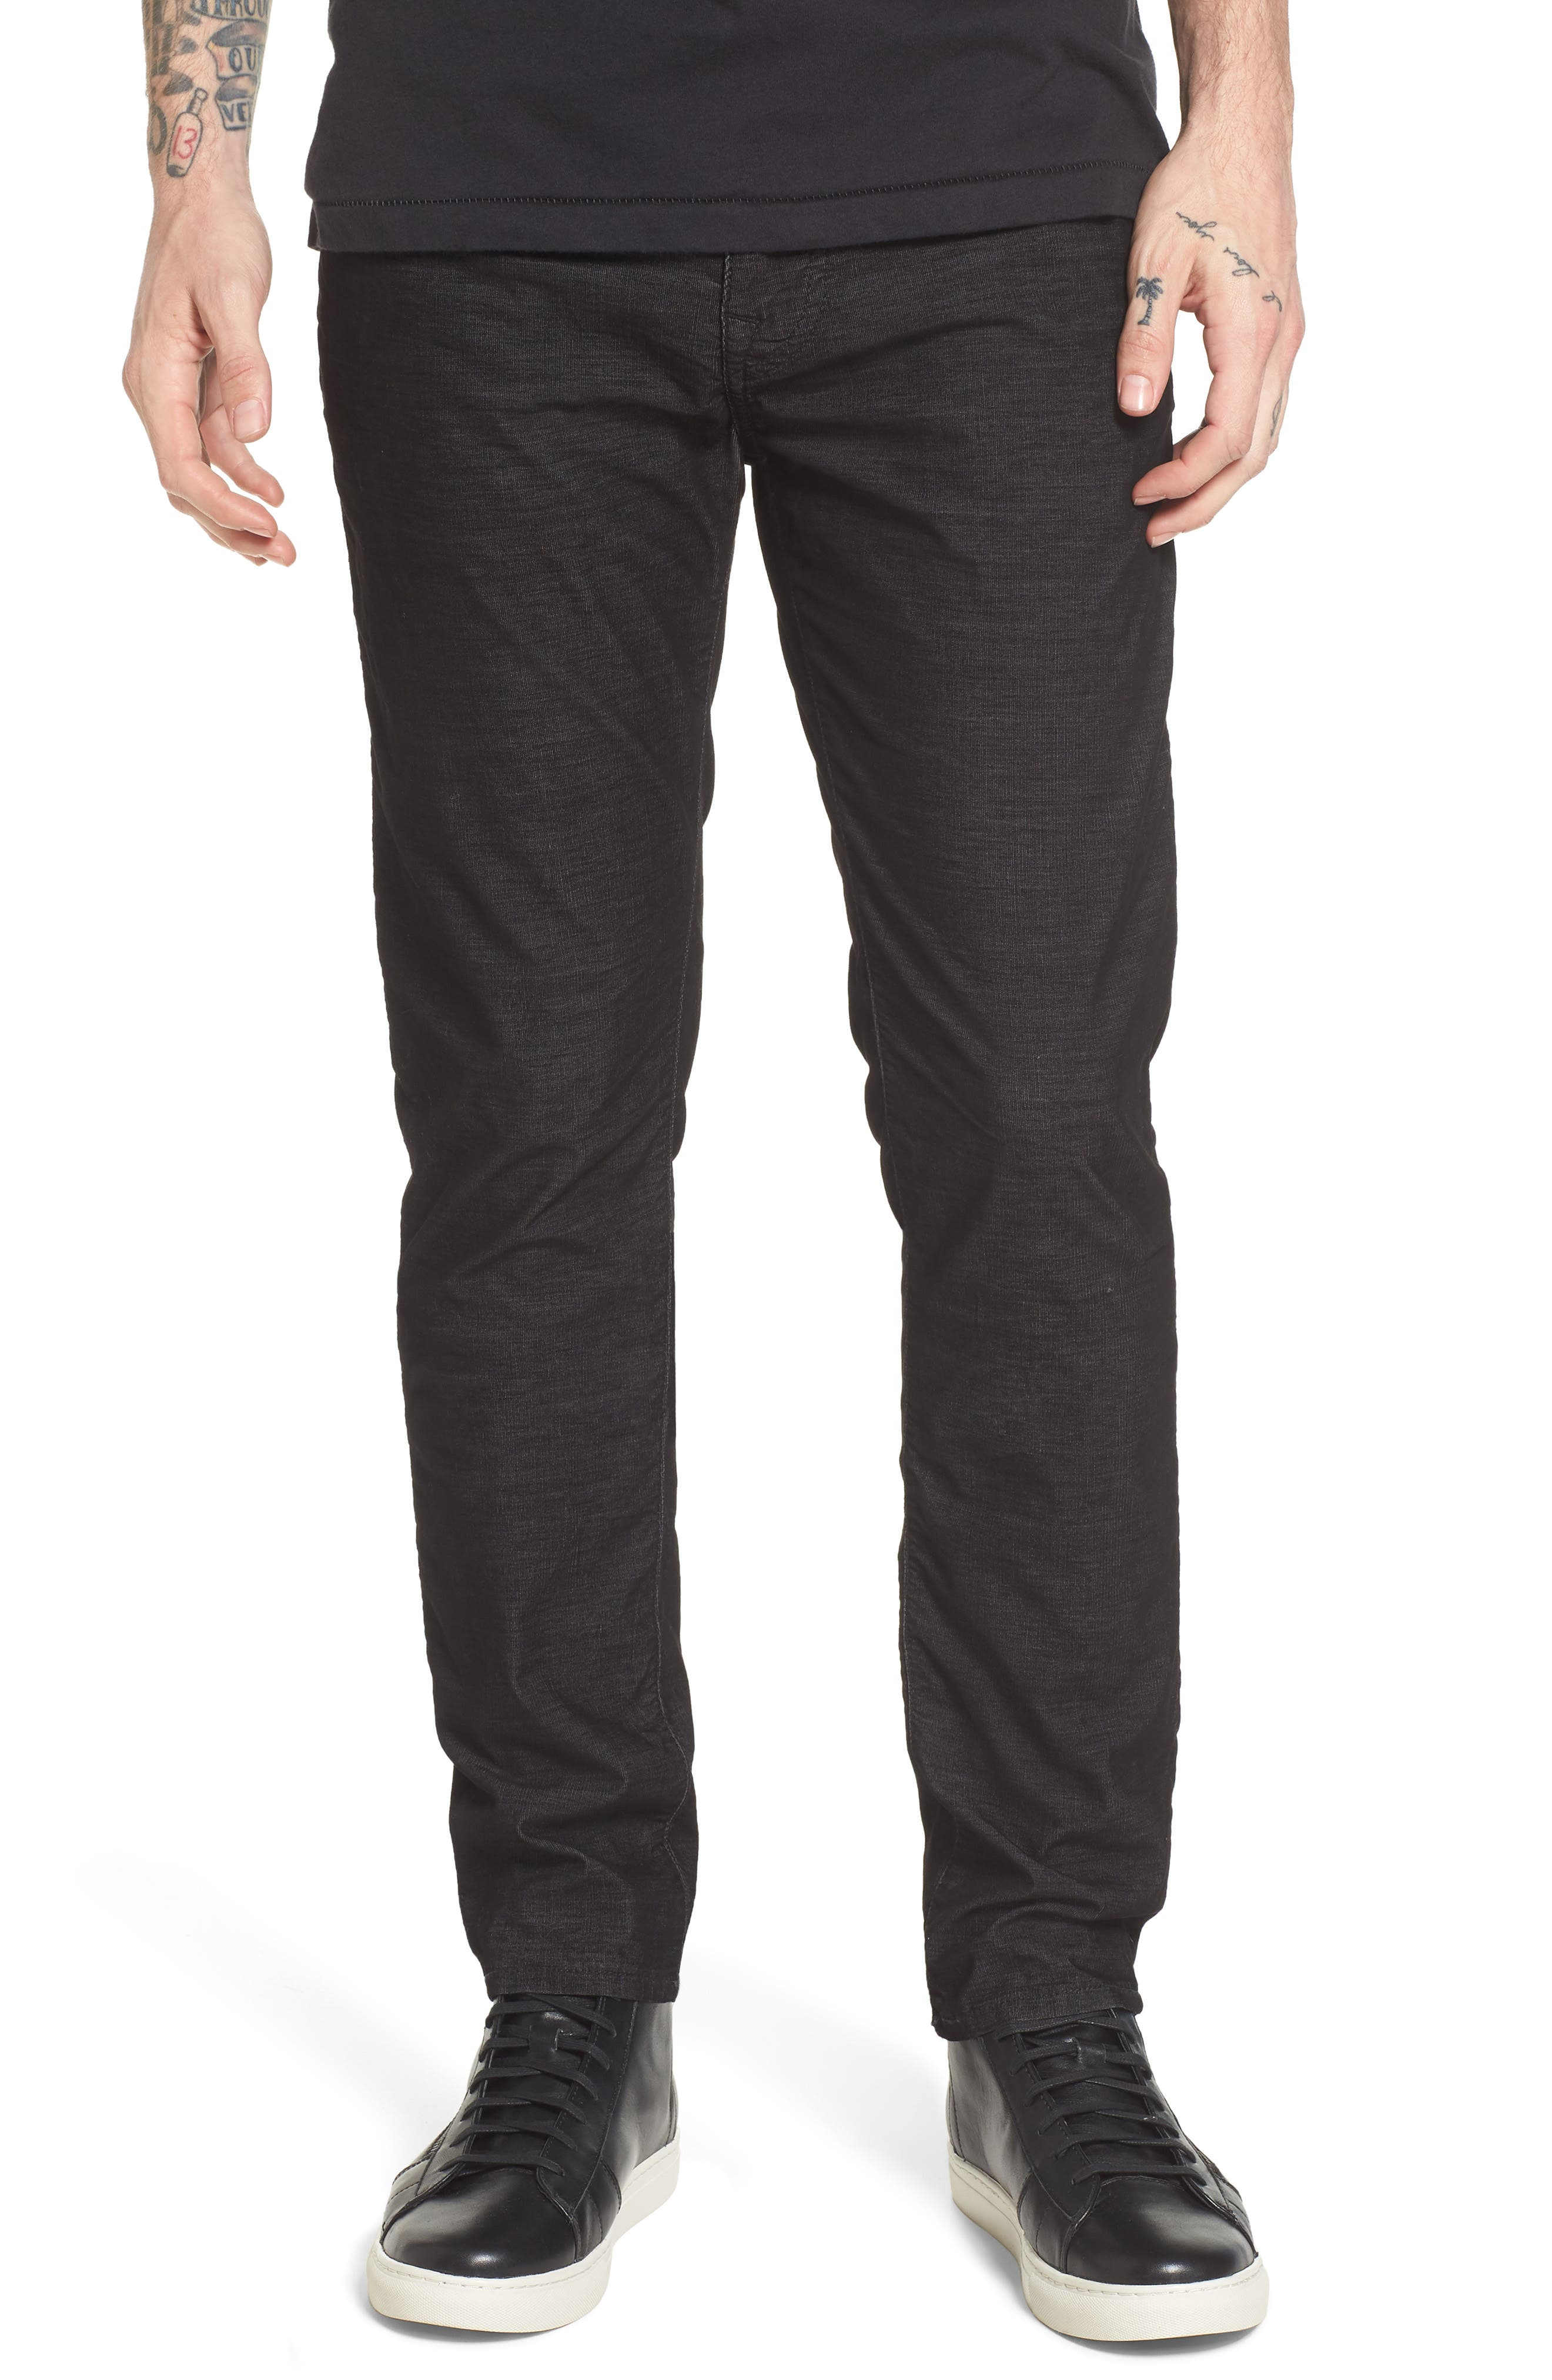 True Religion Brand Jeans Rocco Skinny Fit Corduroy Jeans